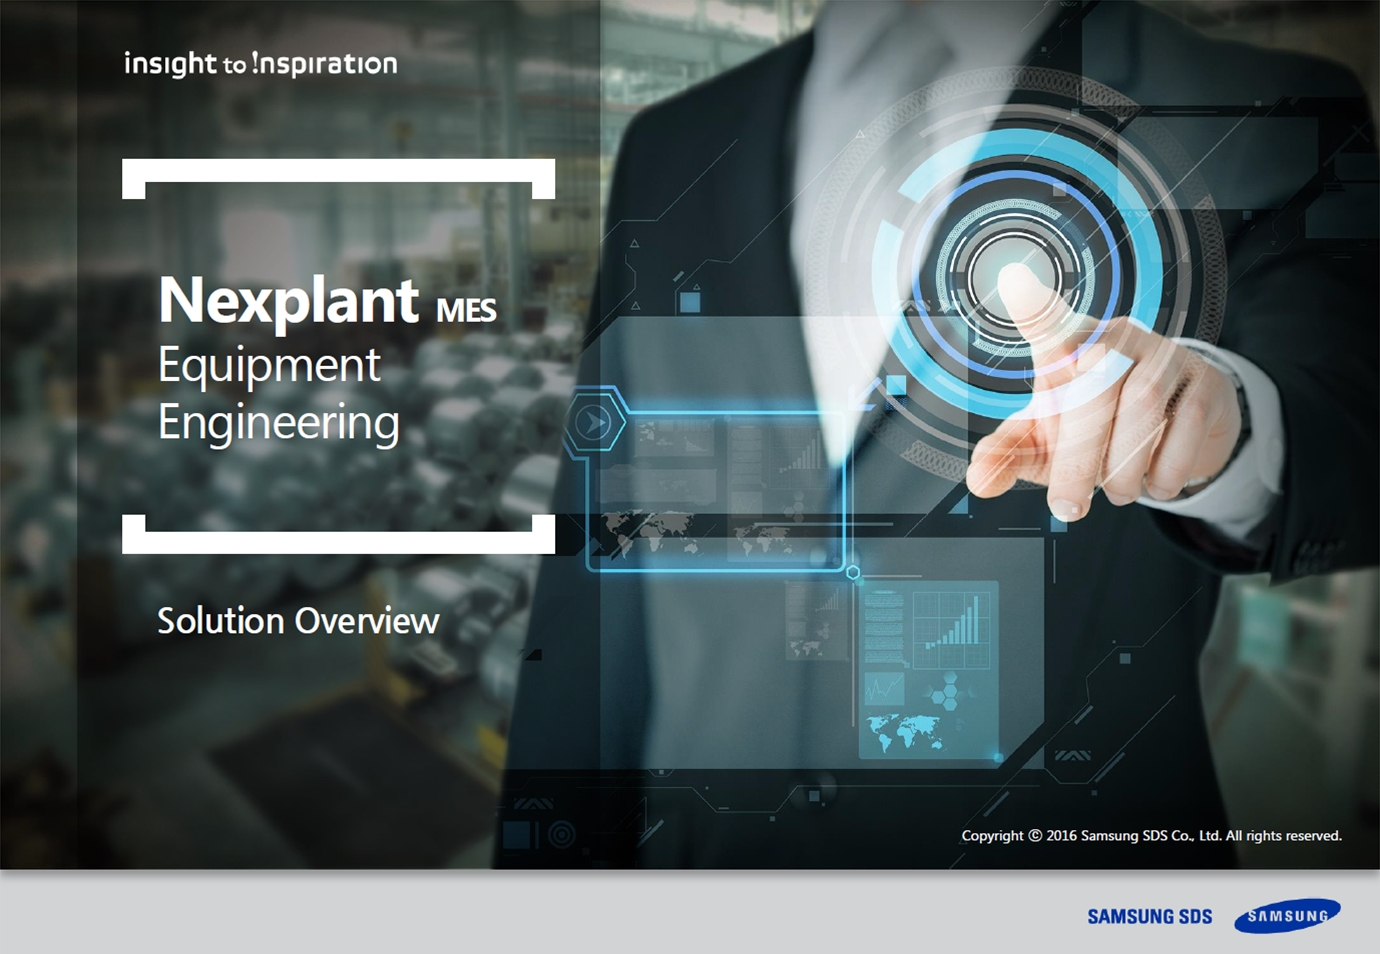 [Nexplant MES][PRESENTATION] Nextplant MES, engenharia de equipamentos em resumo (Proactive core equipment management with low initial investments)